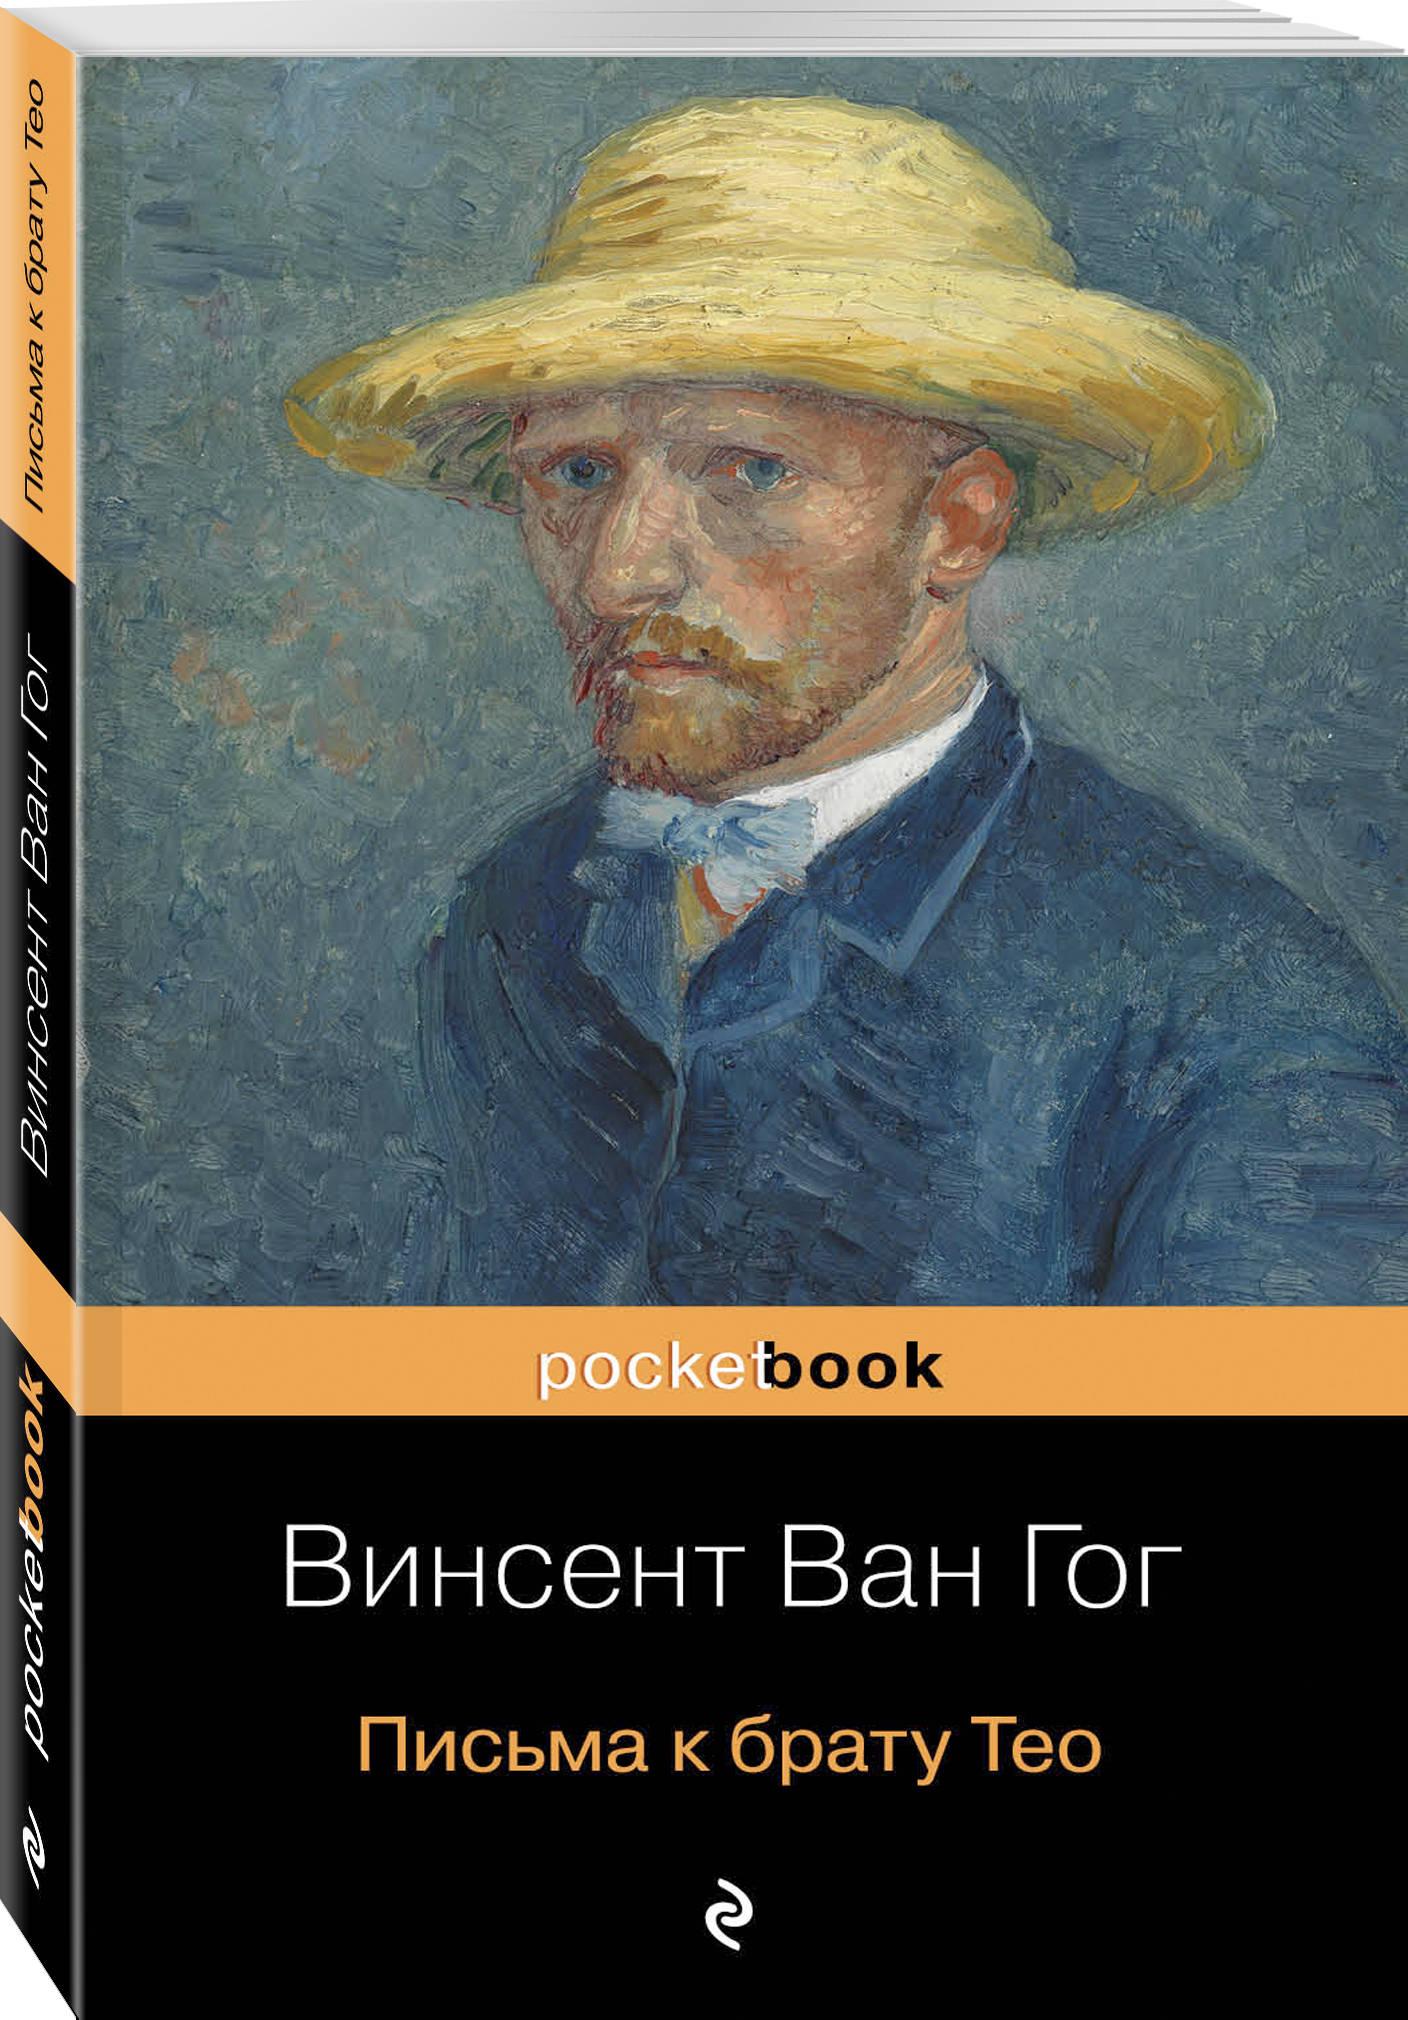 Винсент Ван Гог Письма к брату Тео